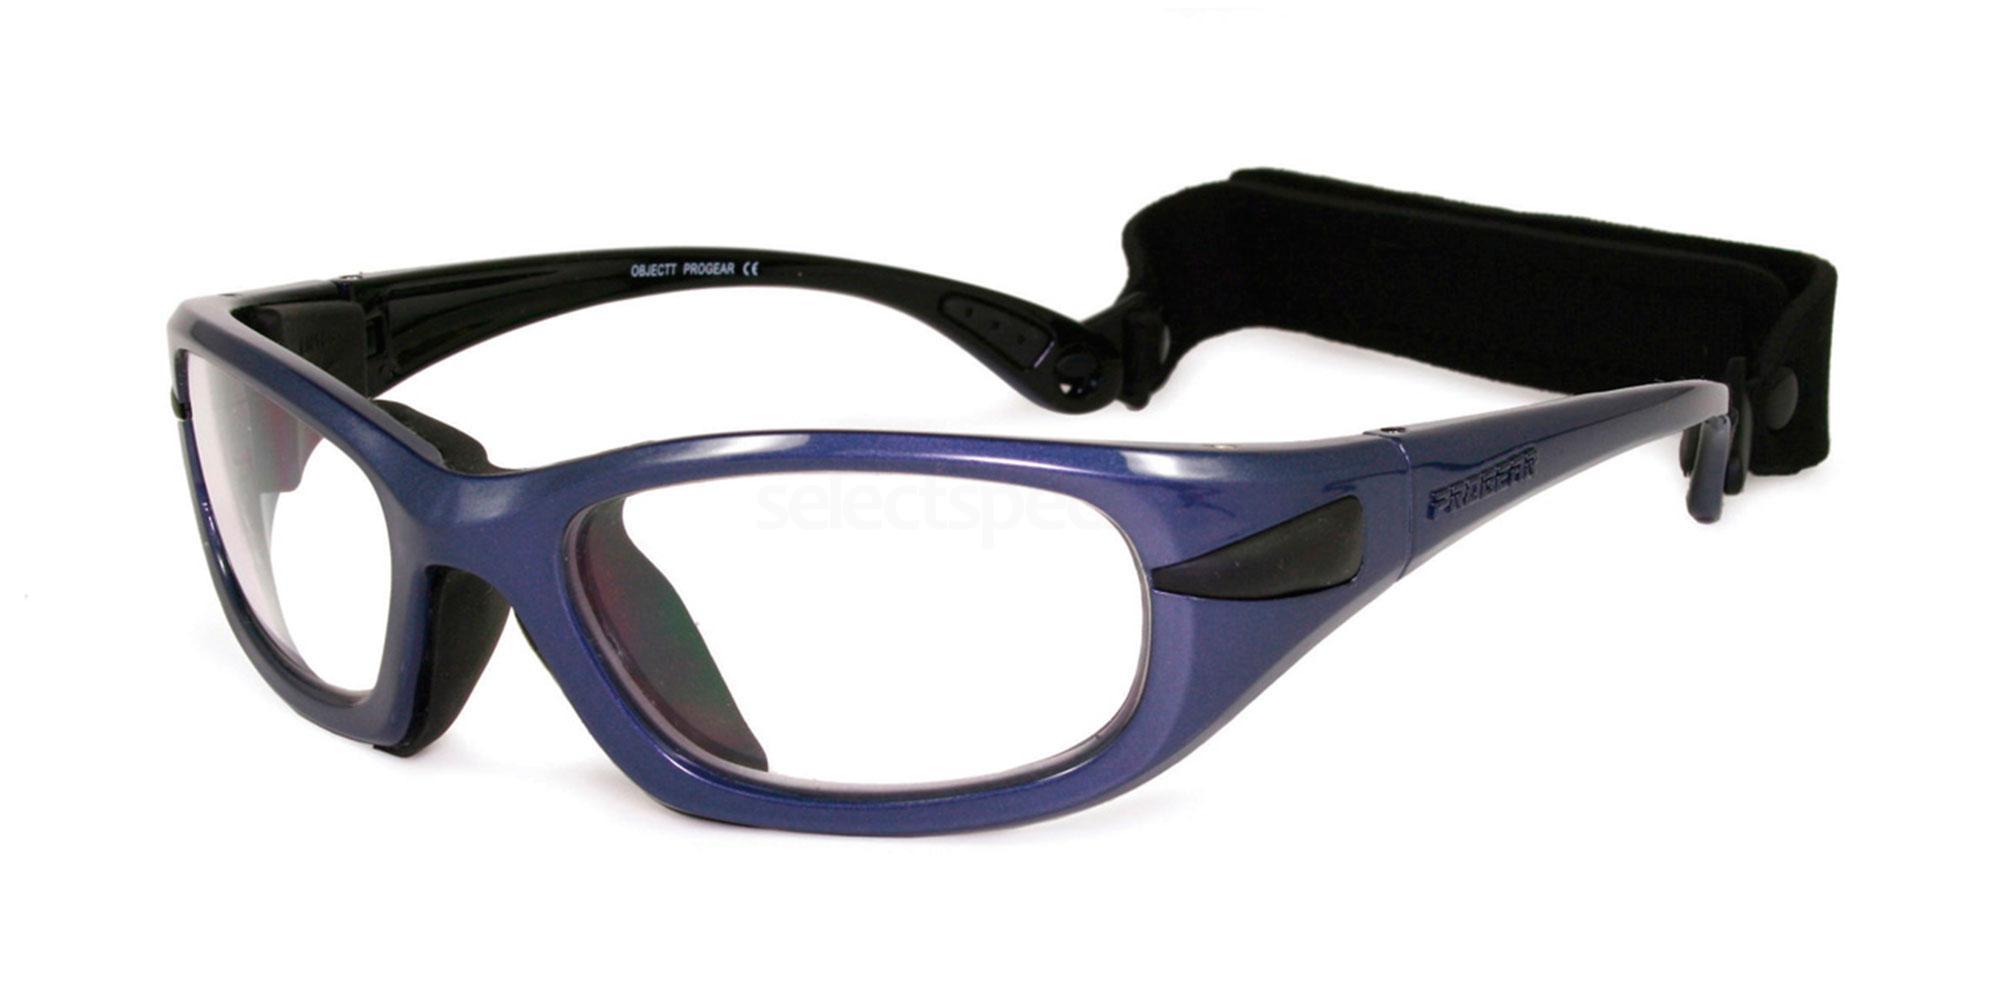 Blue Progear EG-L 1030 Accessories, Sports Eyewear